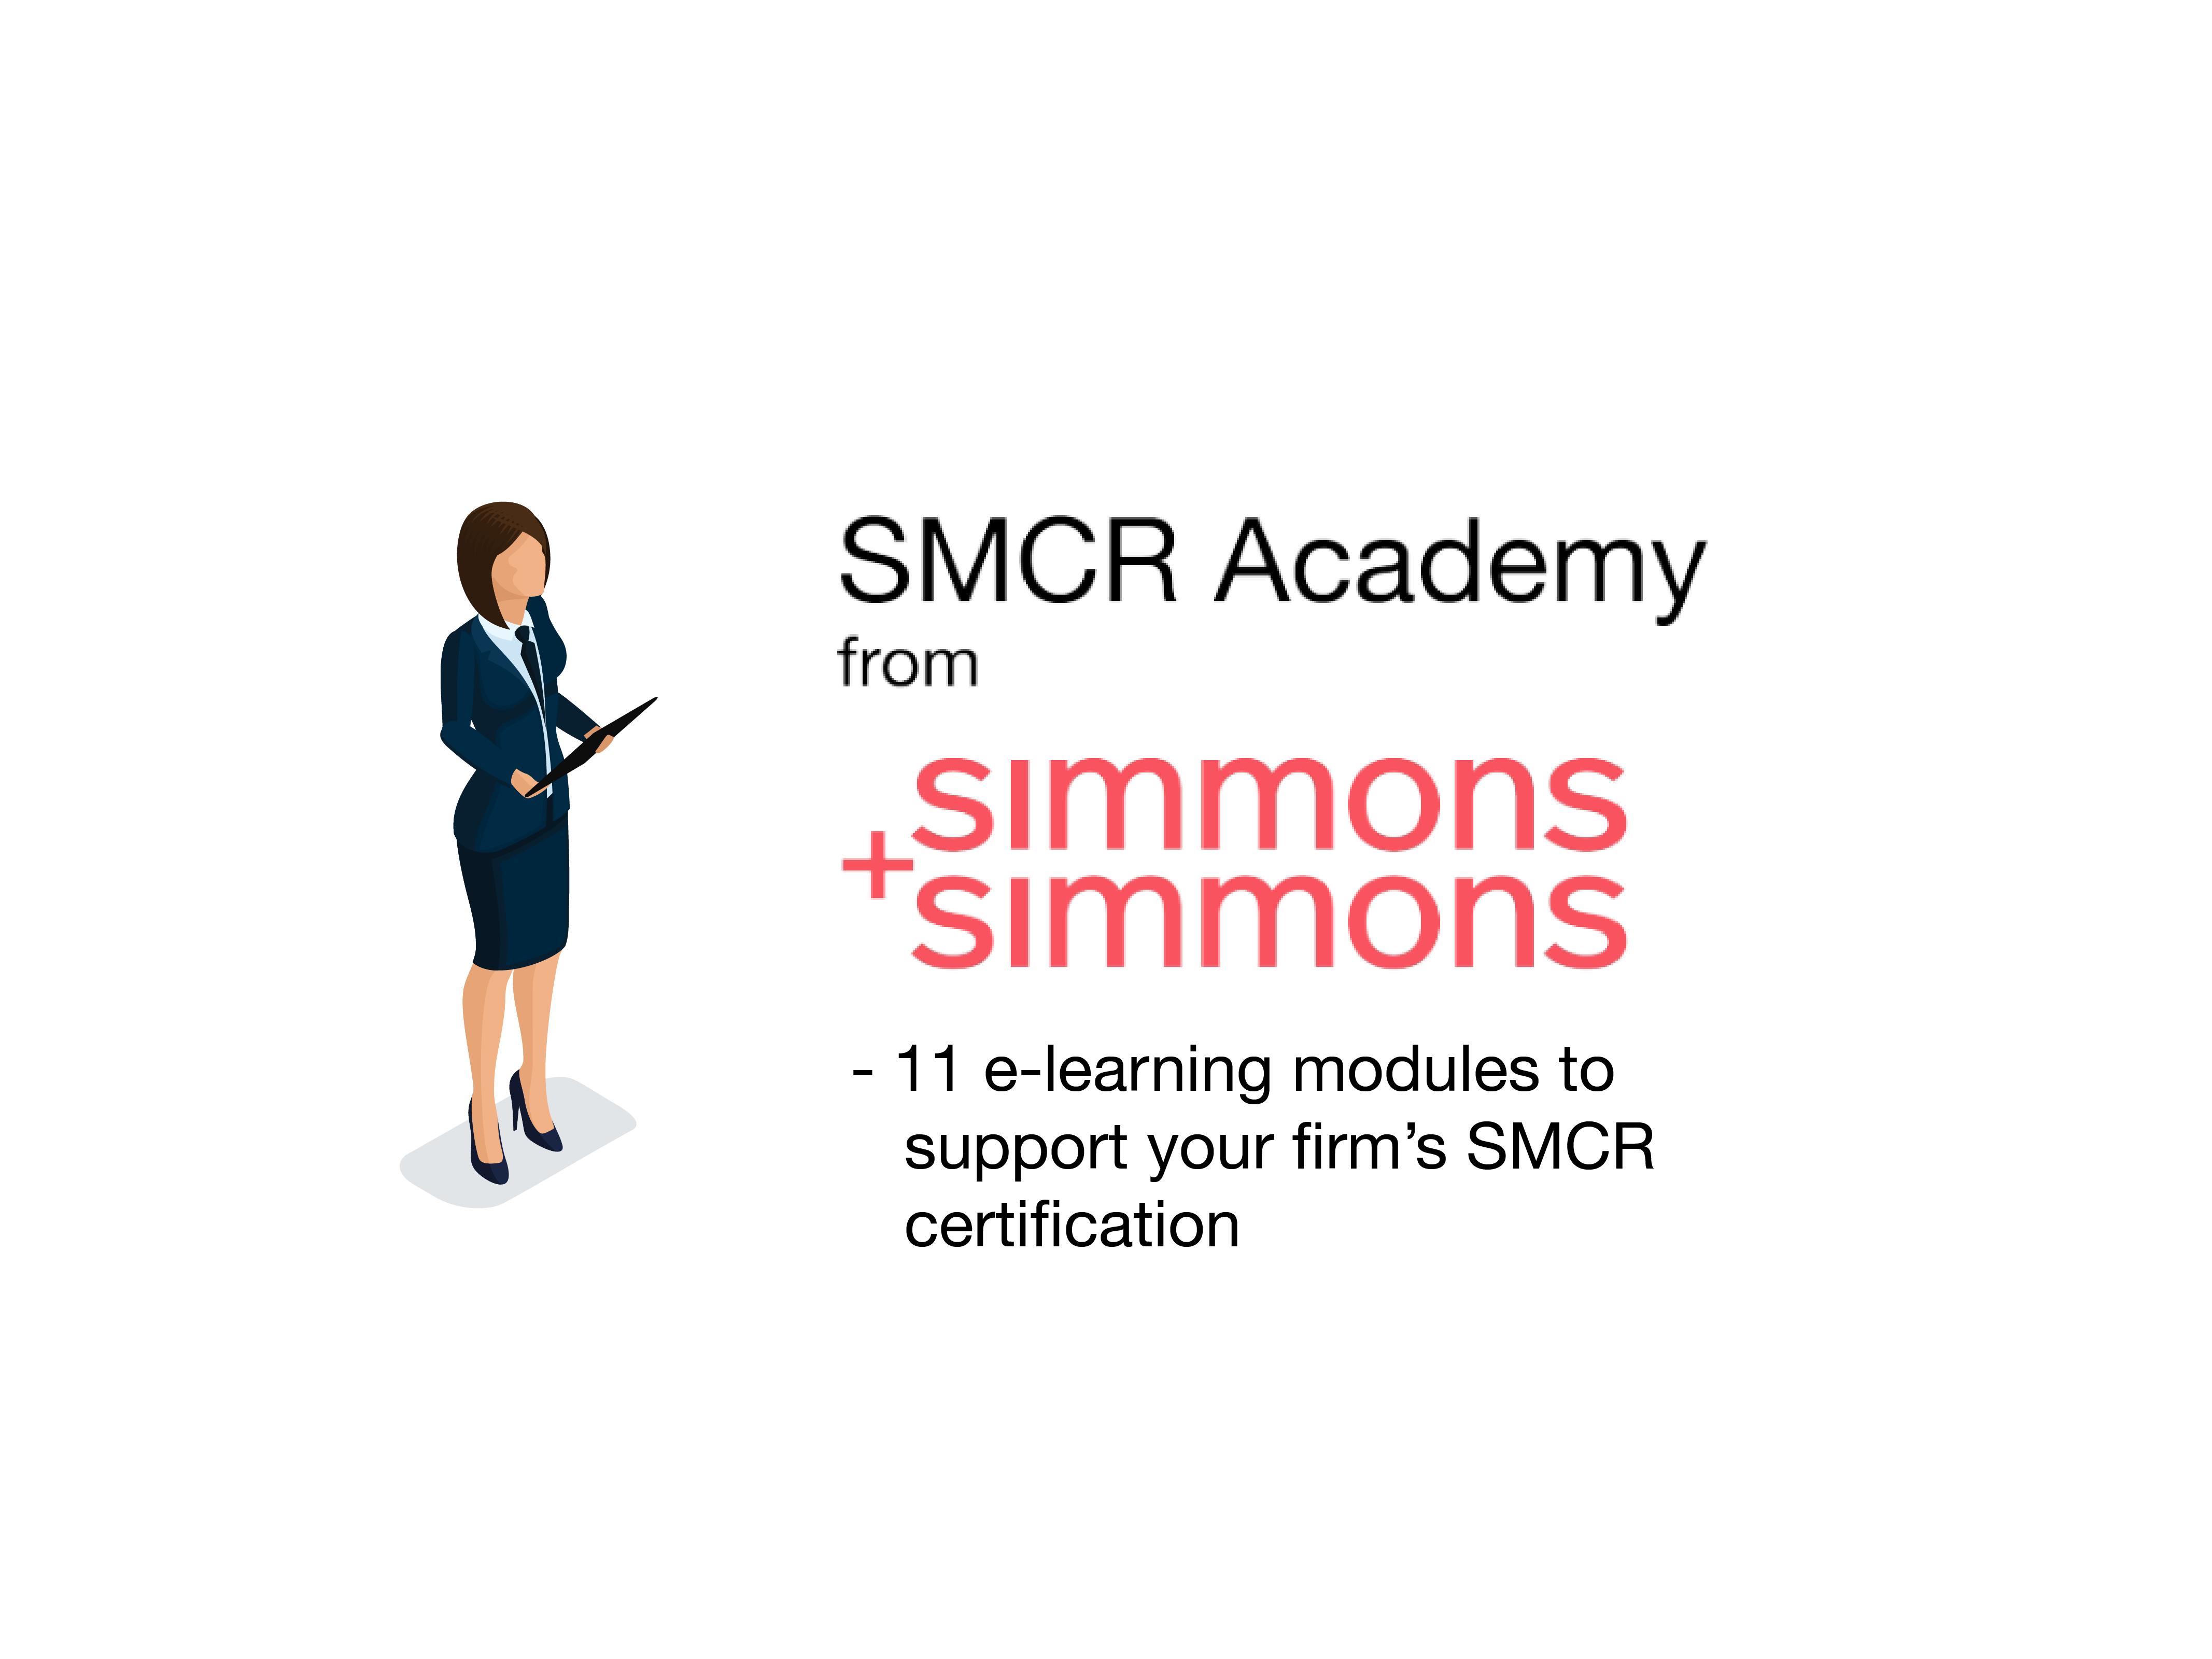 SMCR-Academy-Simmons-Simmons-01